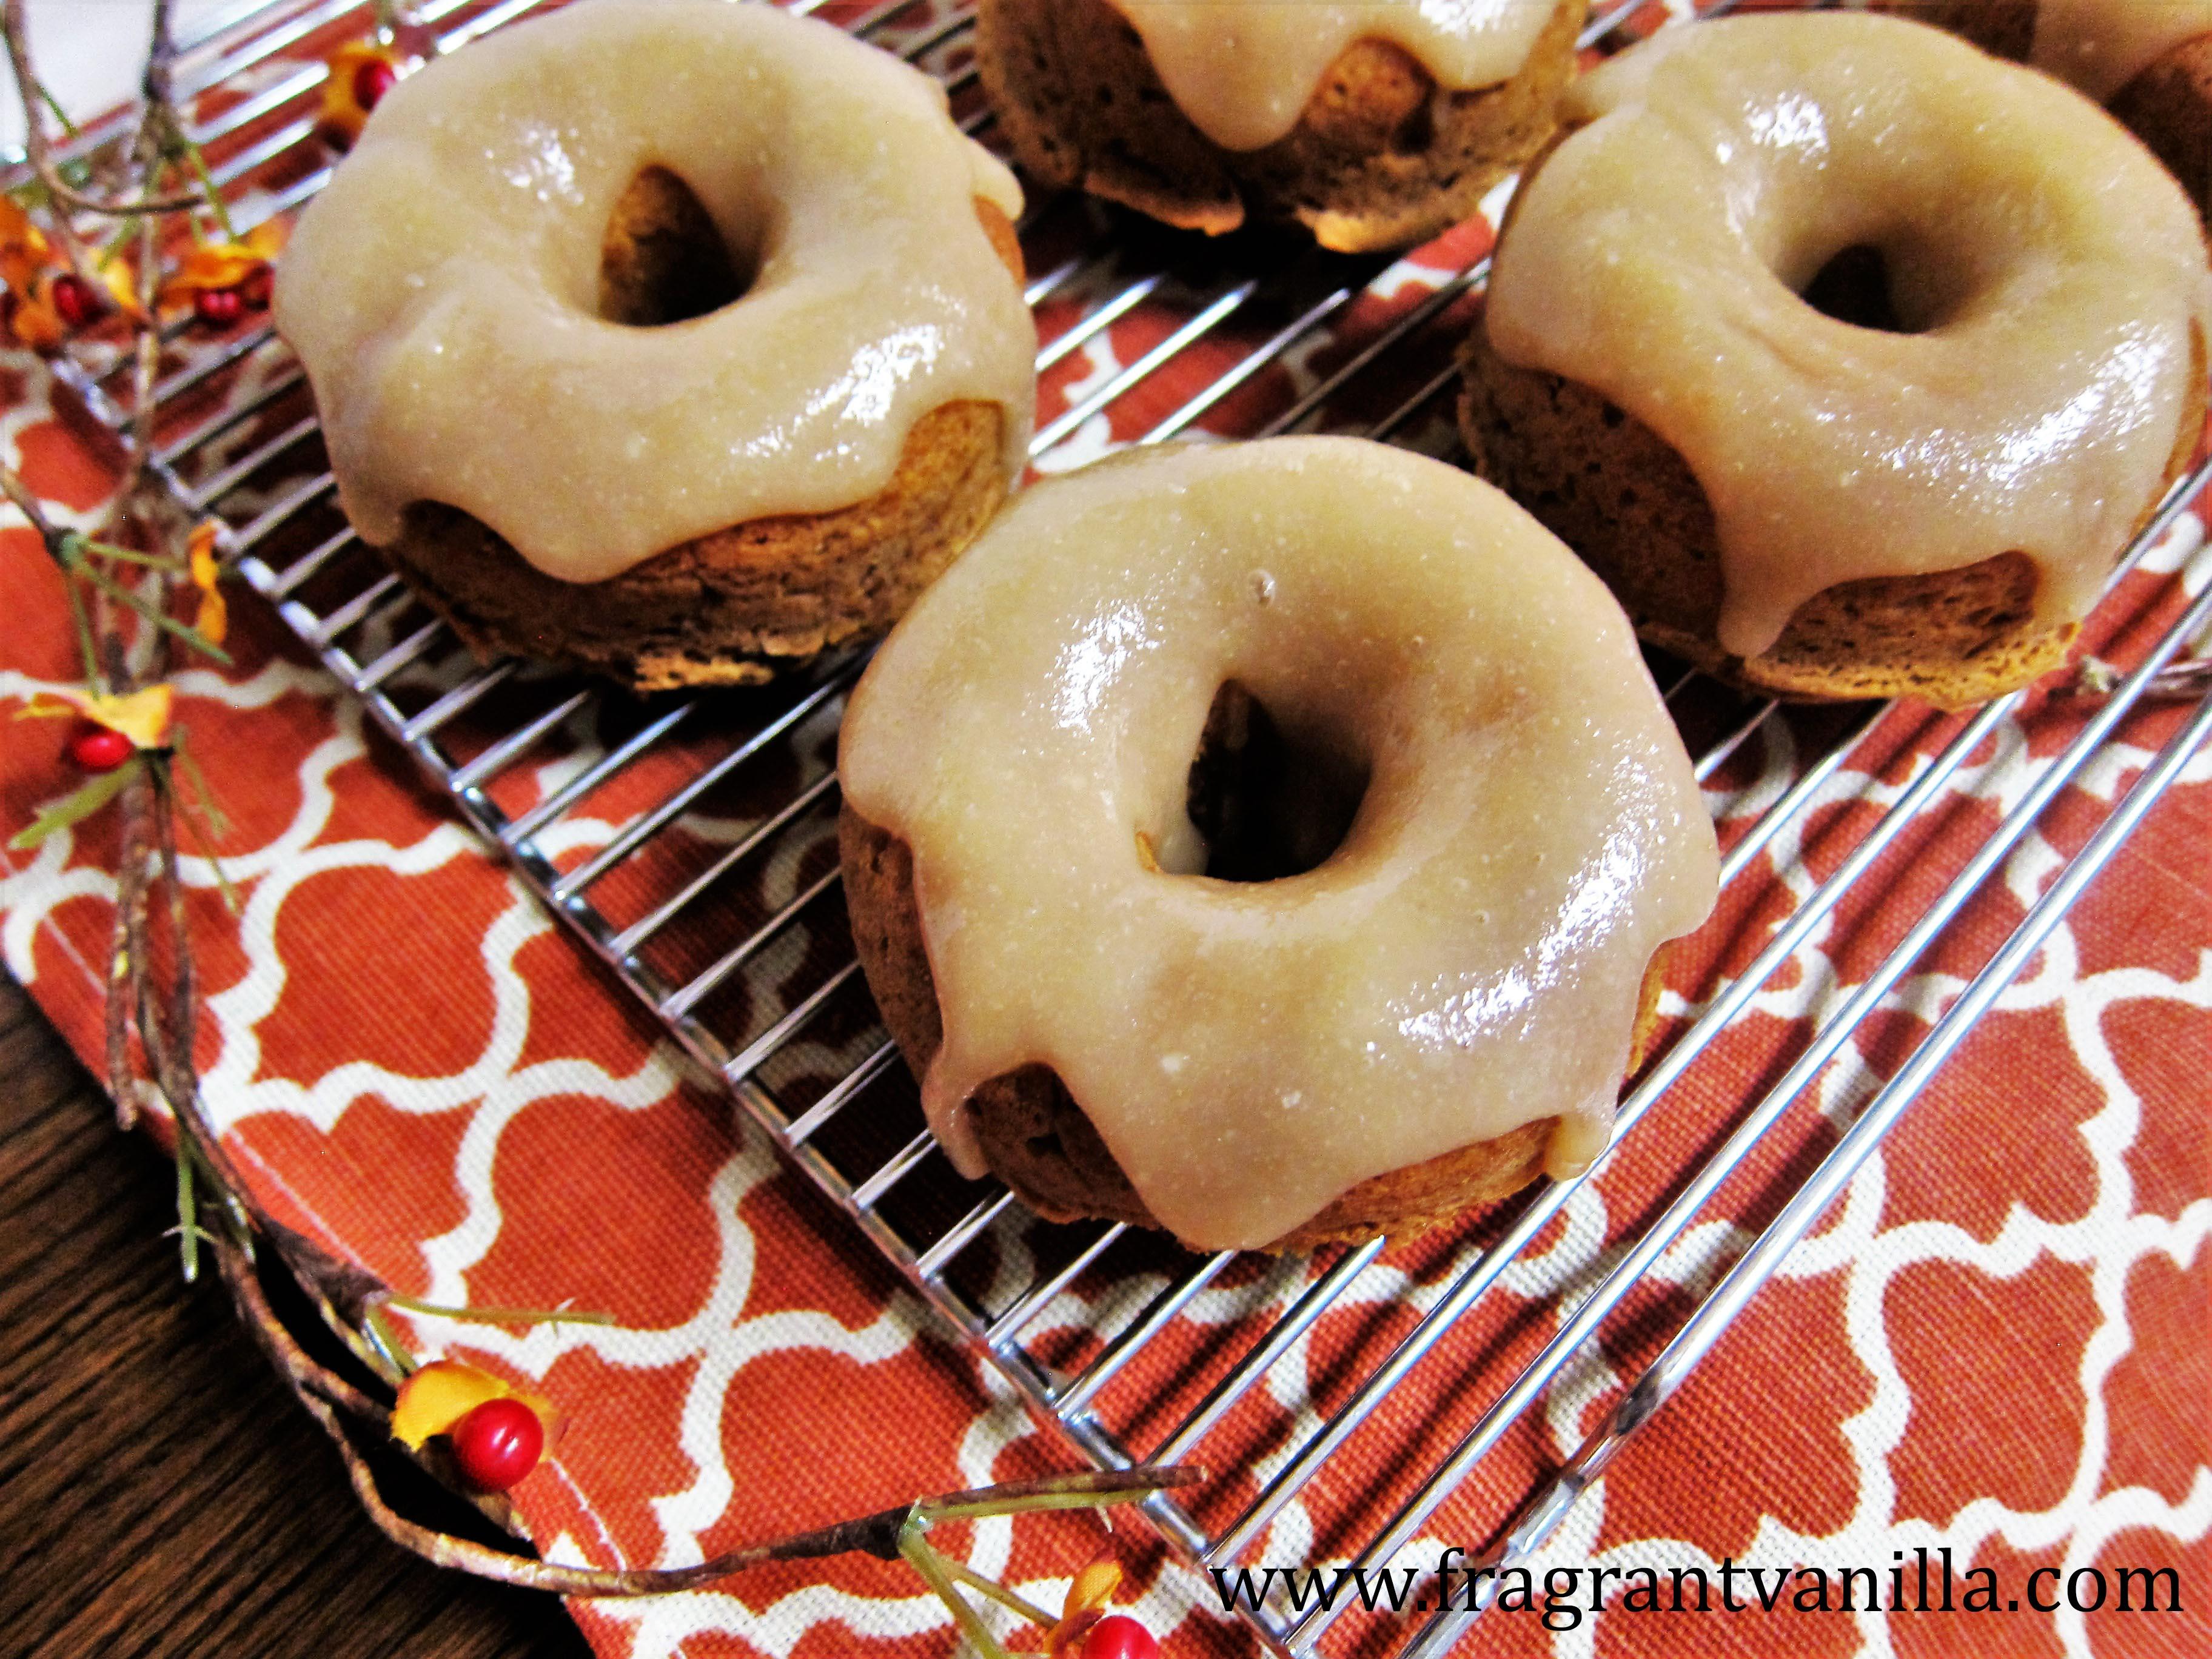 Vegan Pumpkin Doughnuts with Maple glaze